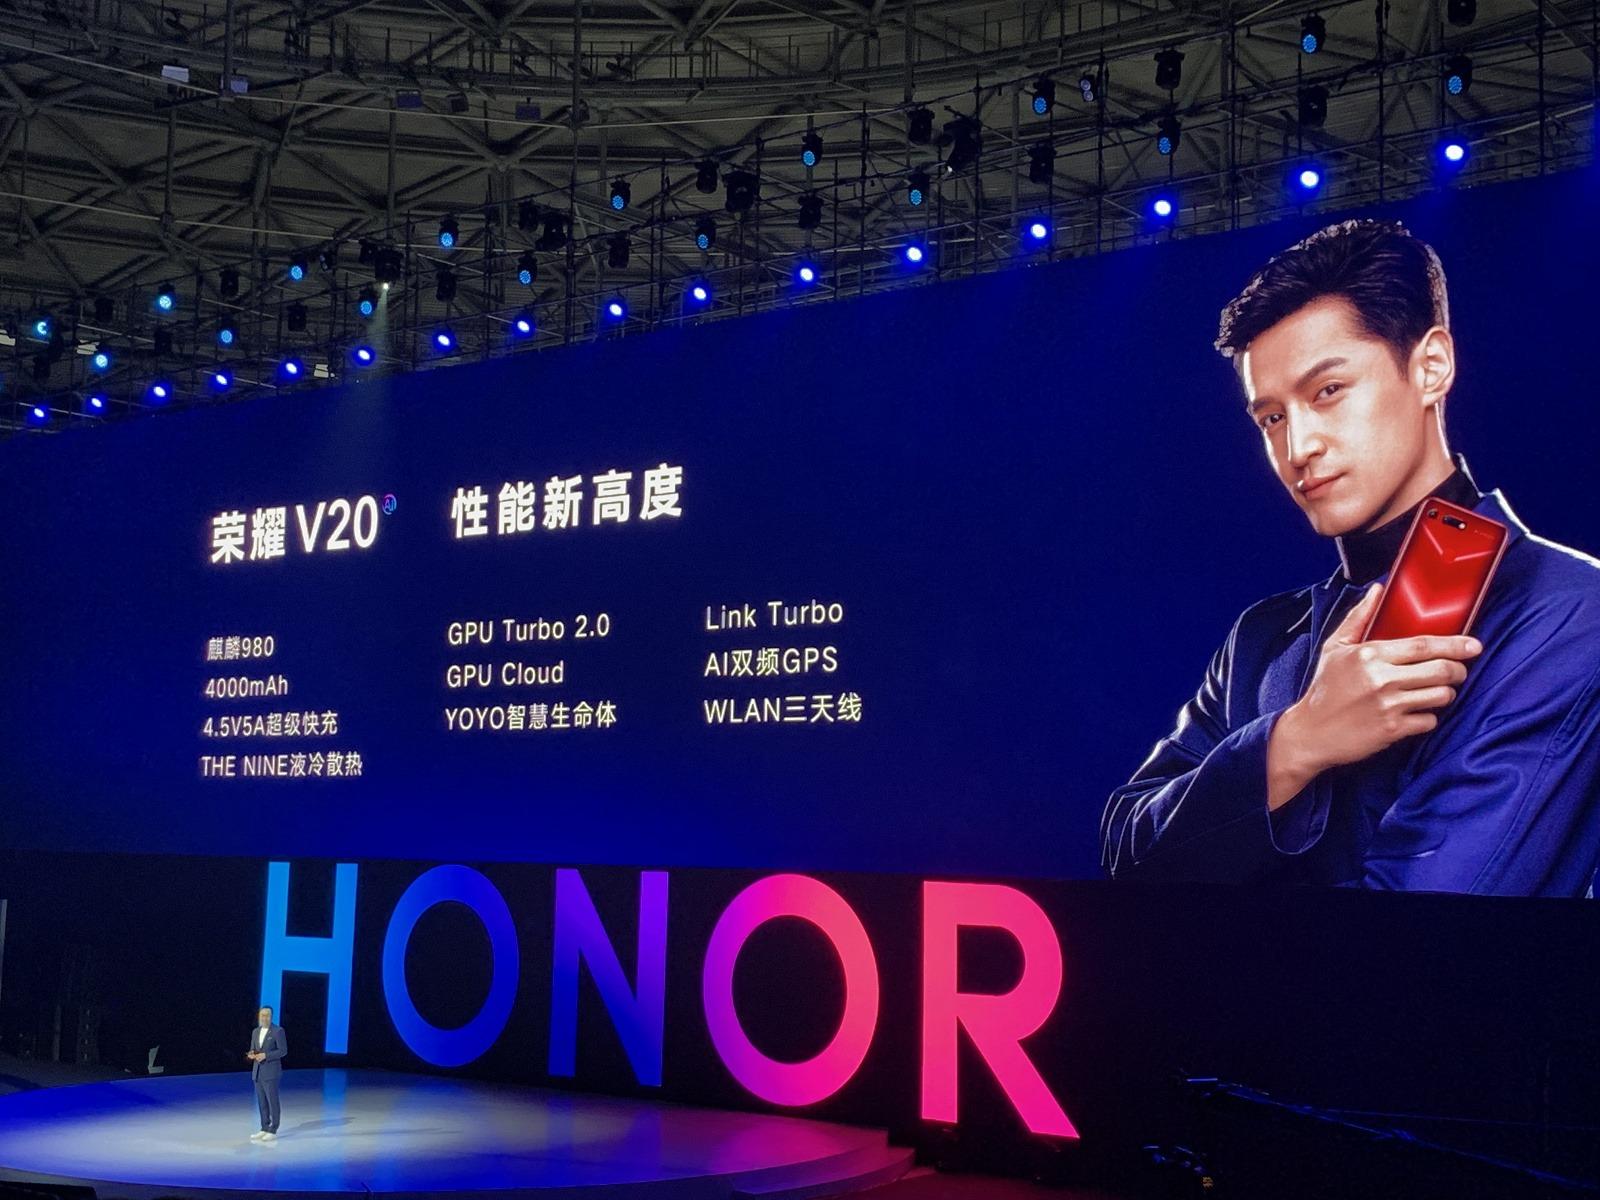 Смартфон Honor V20 представлен официально: SoC Kirin 980, 48-мегапиксельная камера, режим ПК и АКБ емкостью 4000 мАч за 5